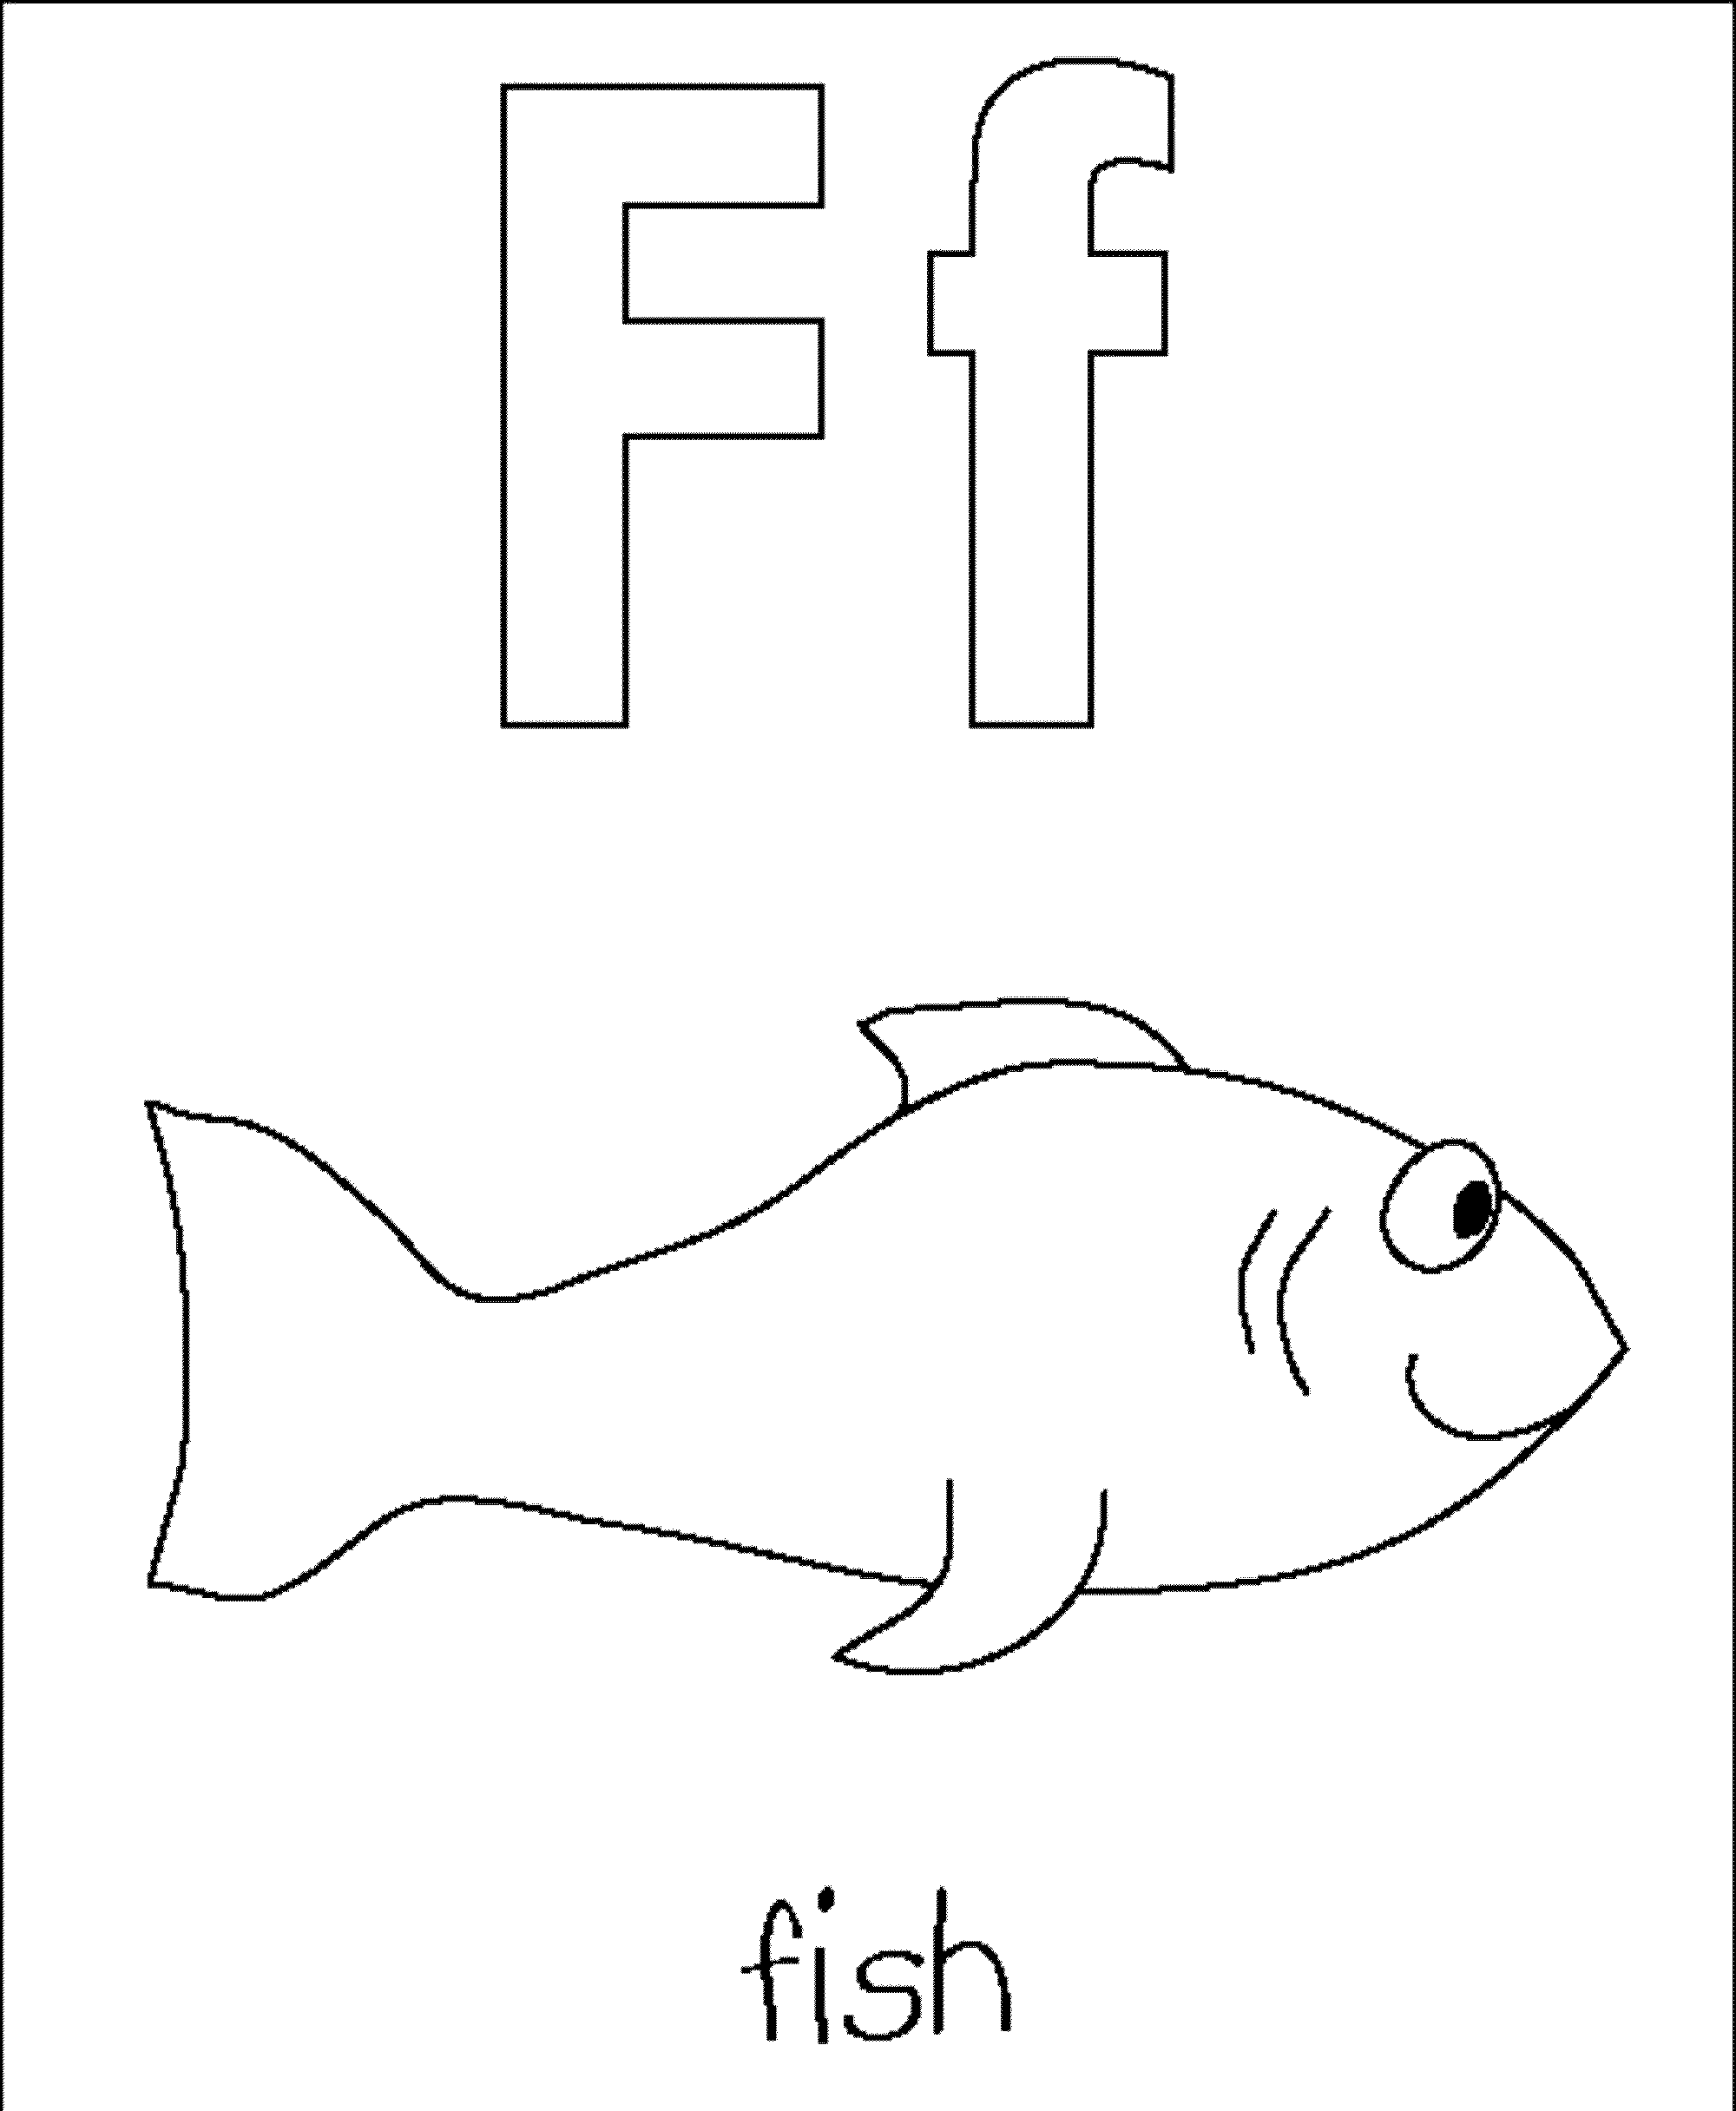 color letter f free printable alphabet coloring pages for kids best f letter color